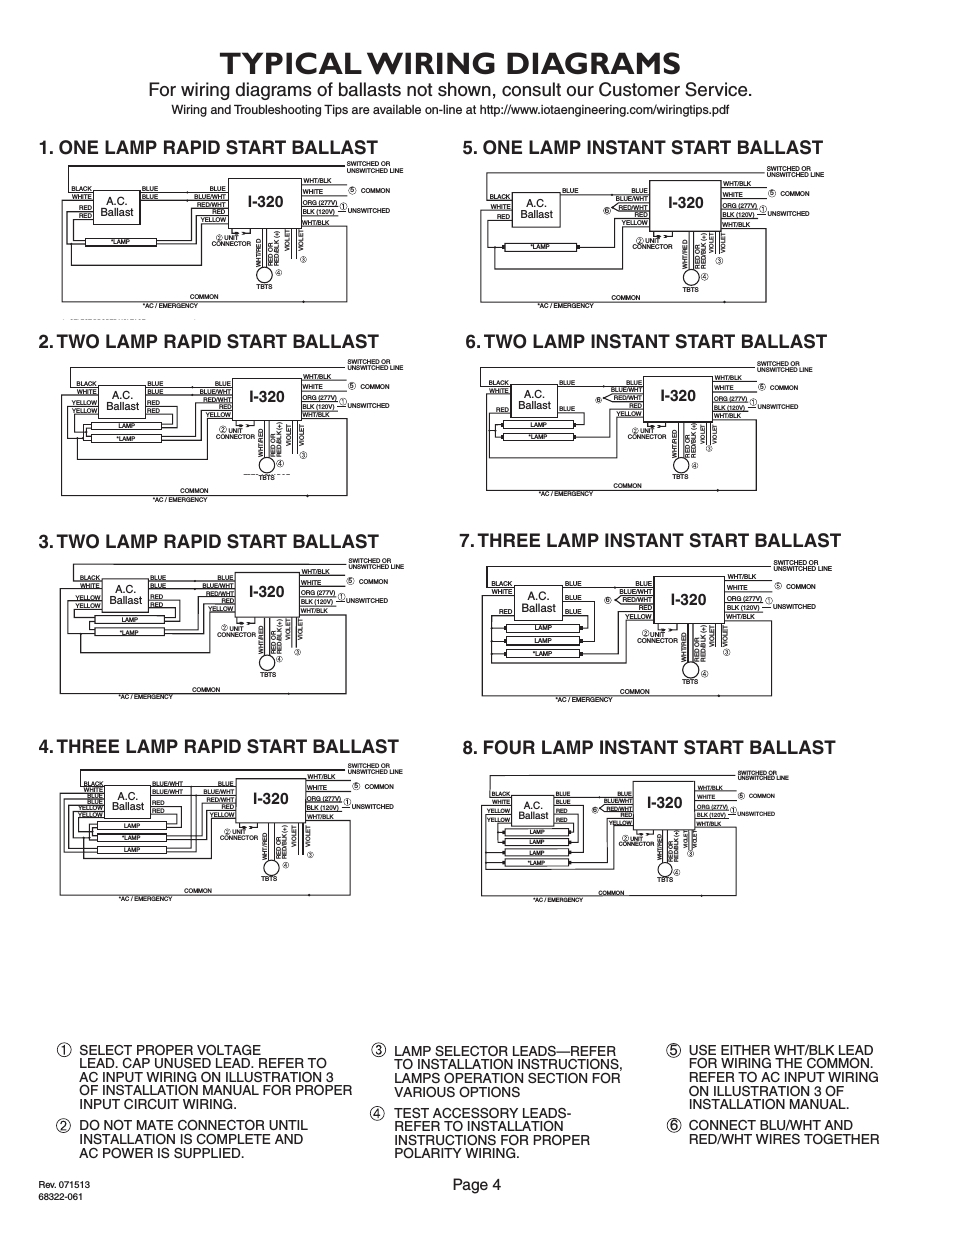 Iota I320 Emergency Ballast Wiring Diagram